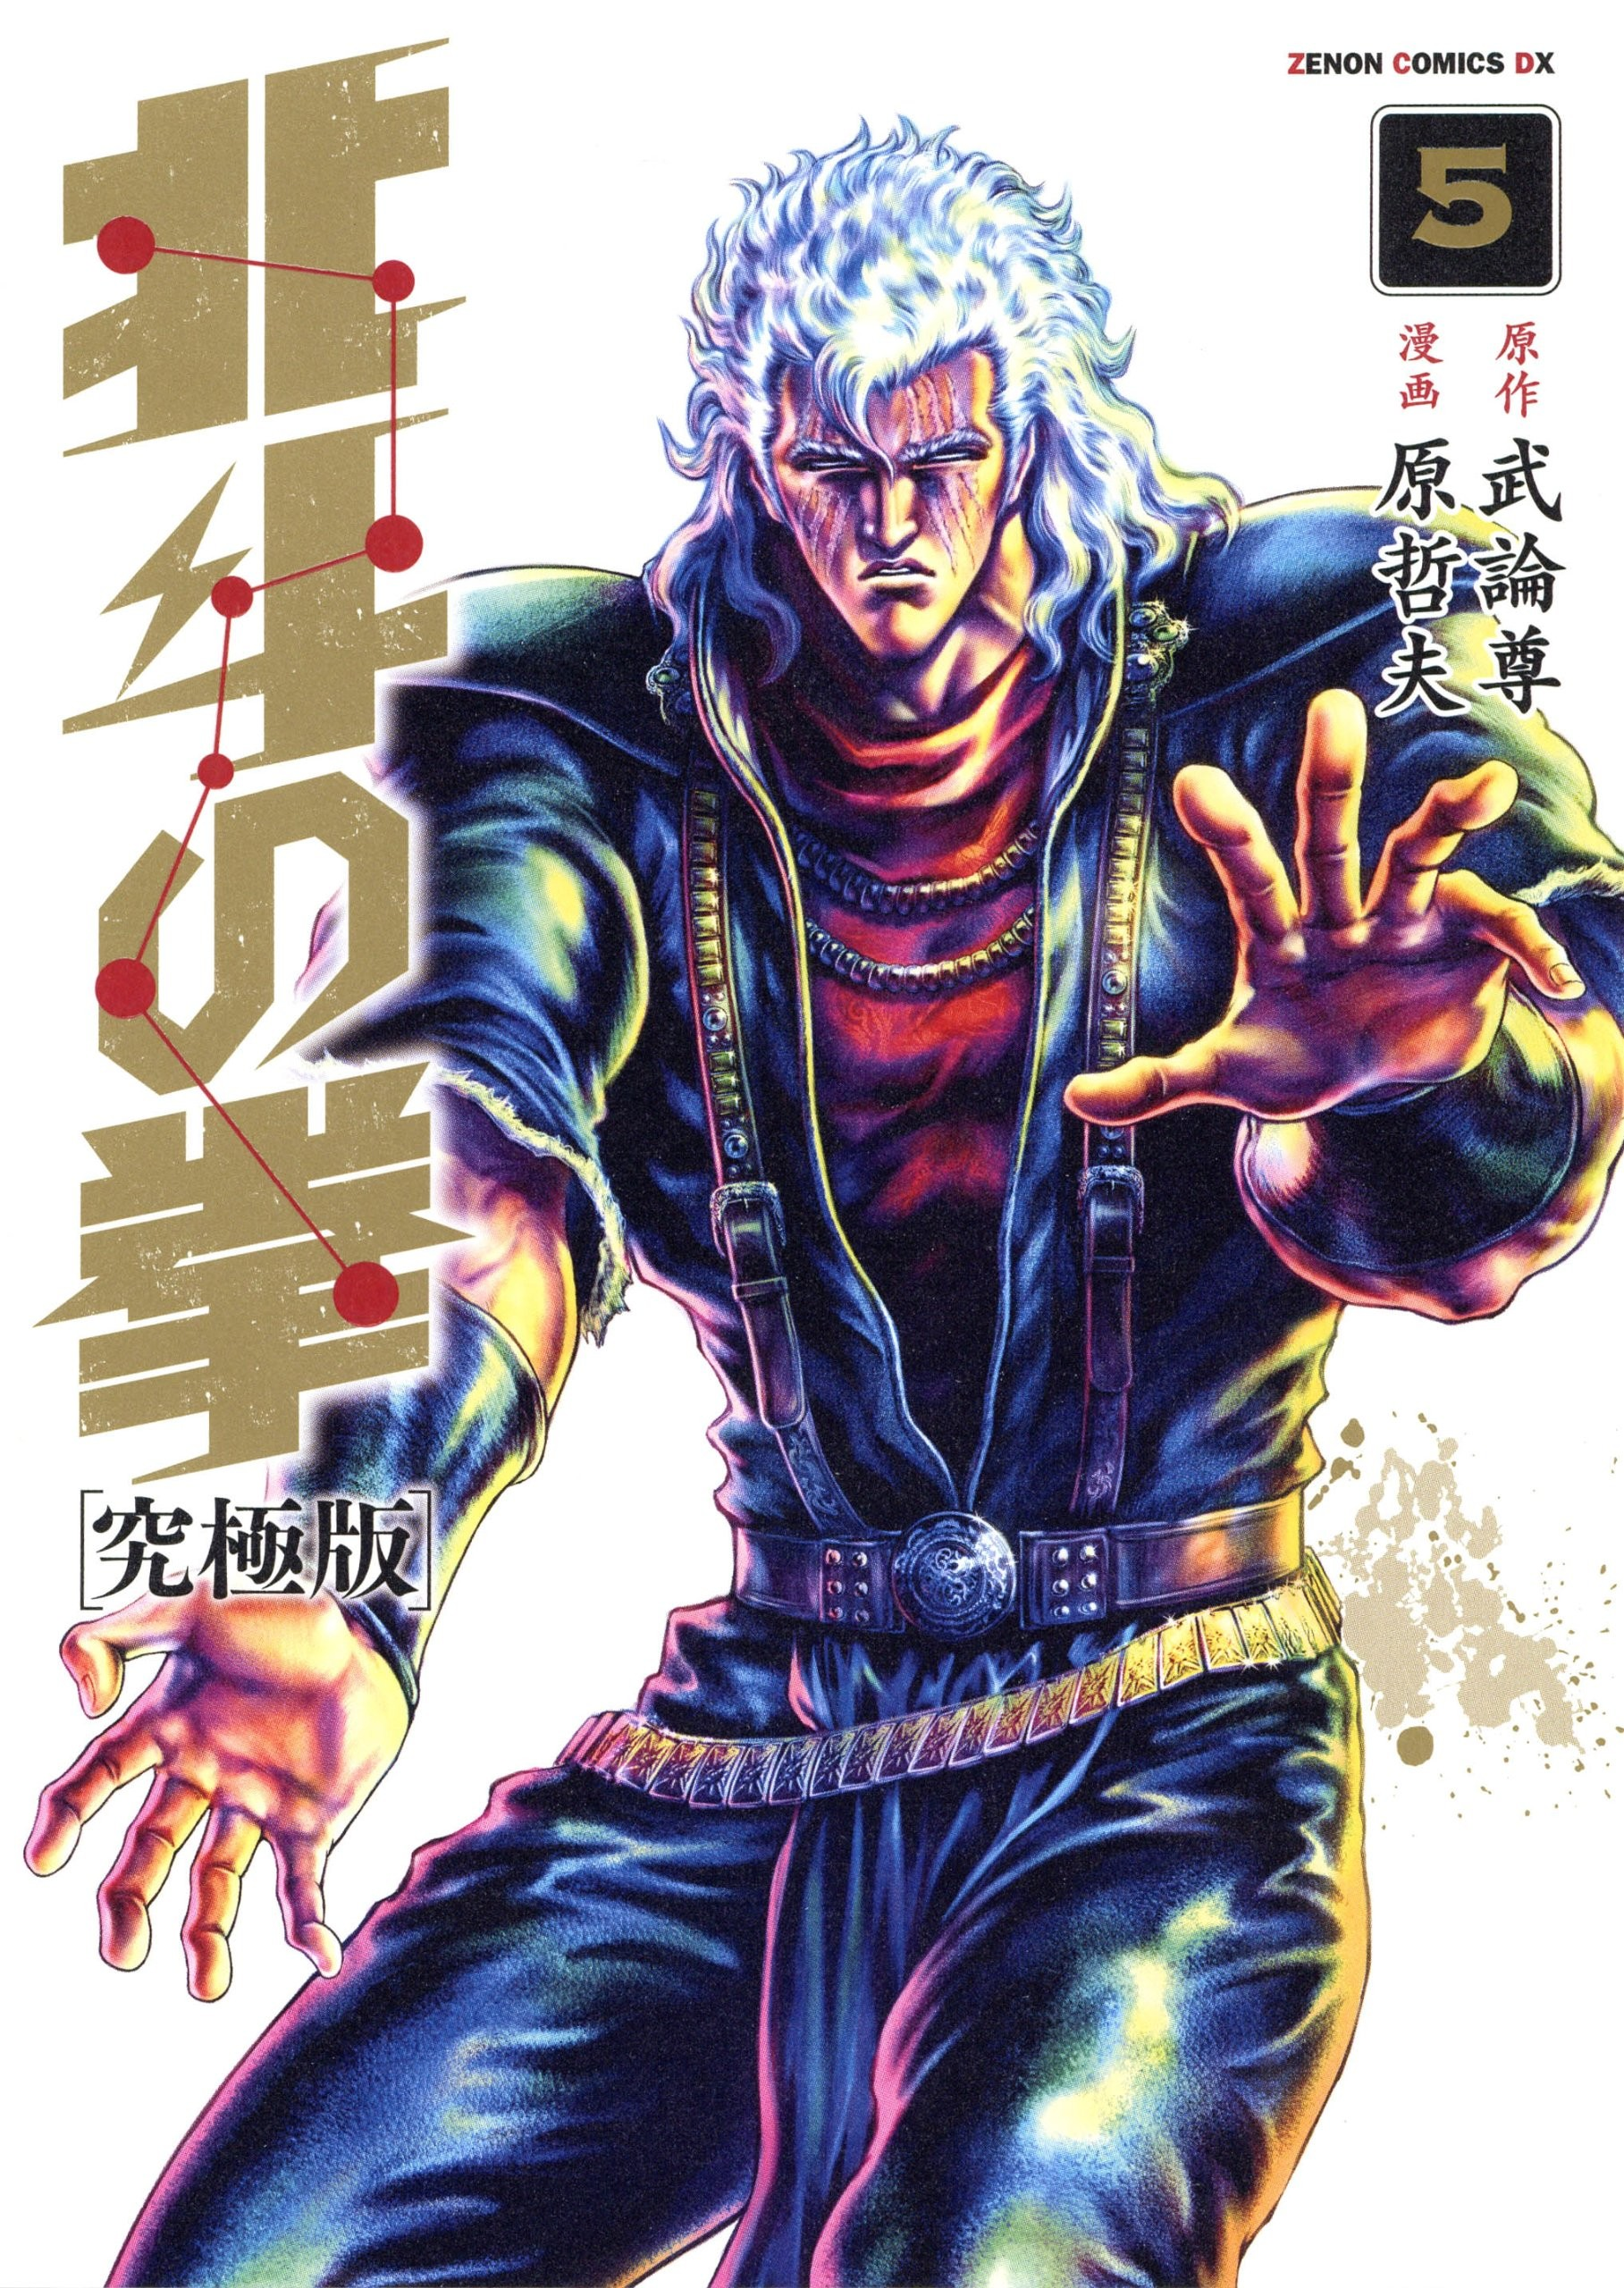 Fist Of The North Star Musou Tensei Kenshiro Kenshiro Photo